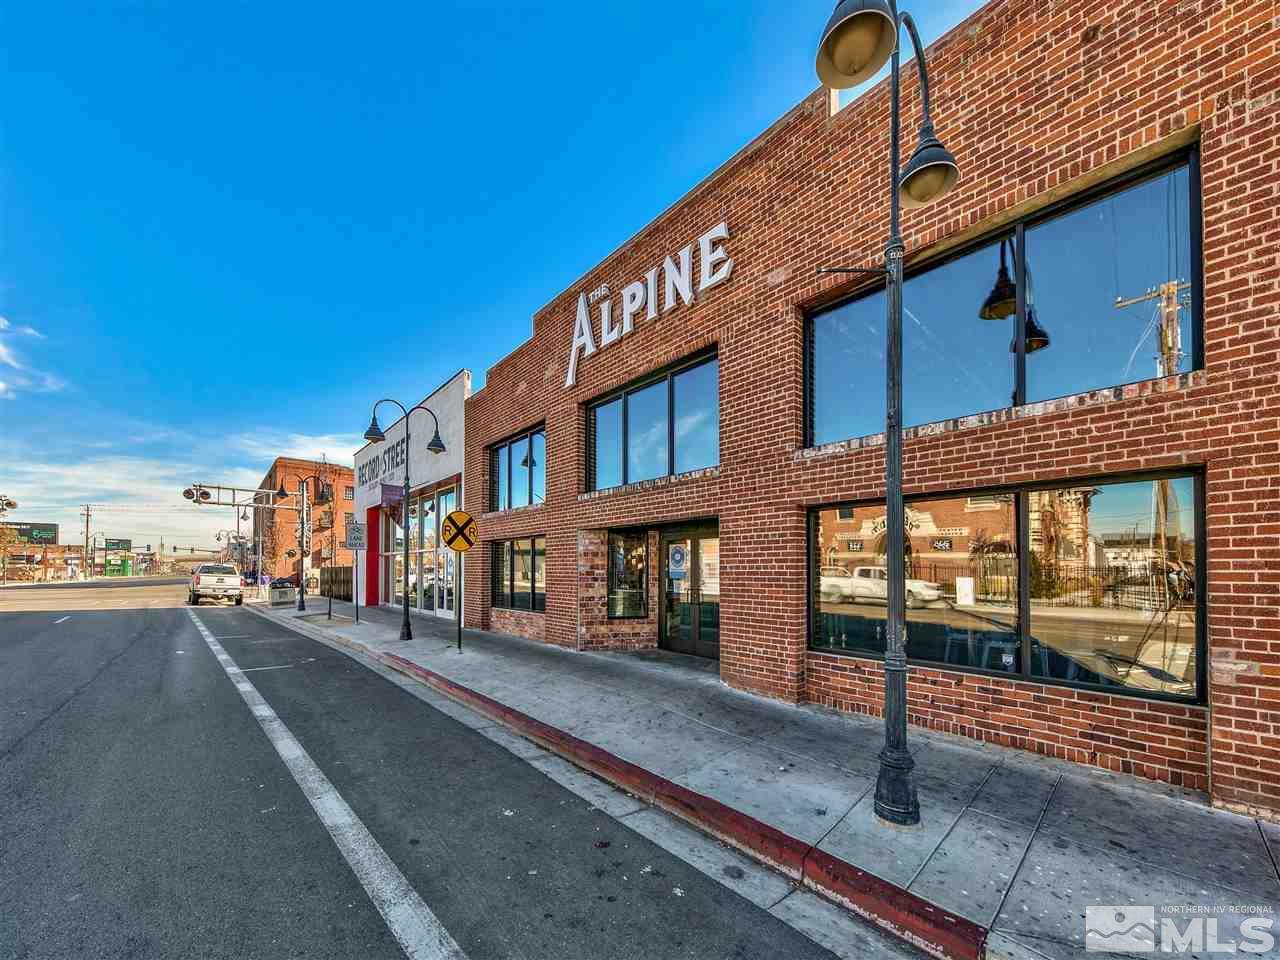 Image for 324 E 4th Street, Reno, NV 89512